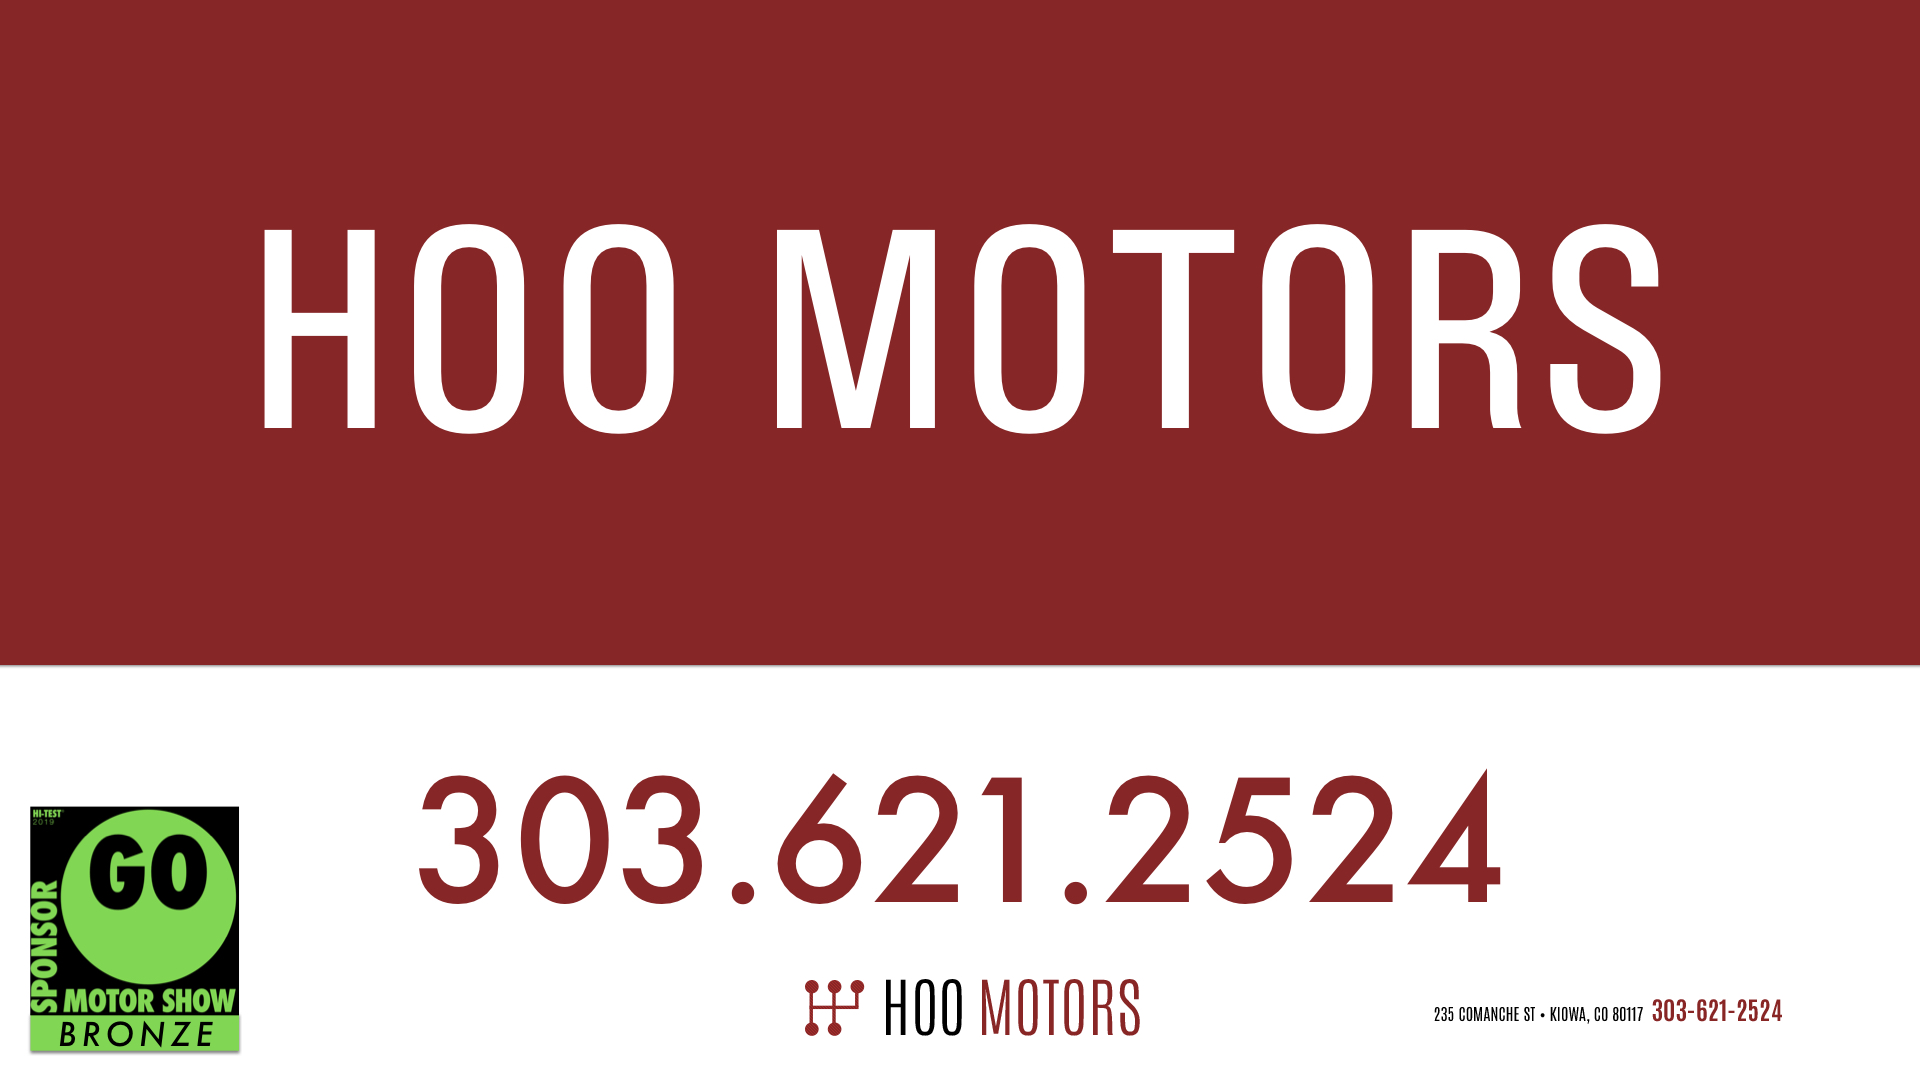 HOO MOTORS